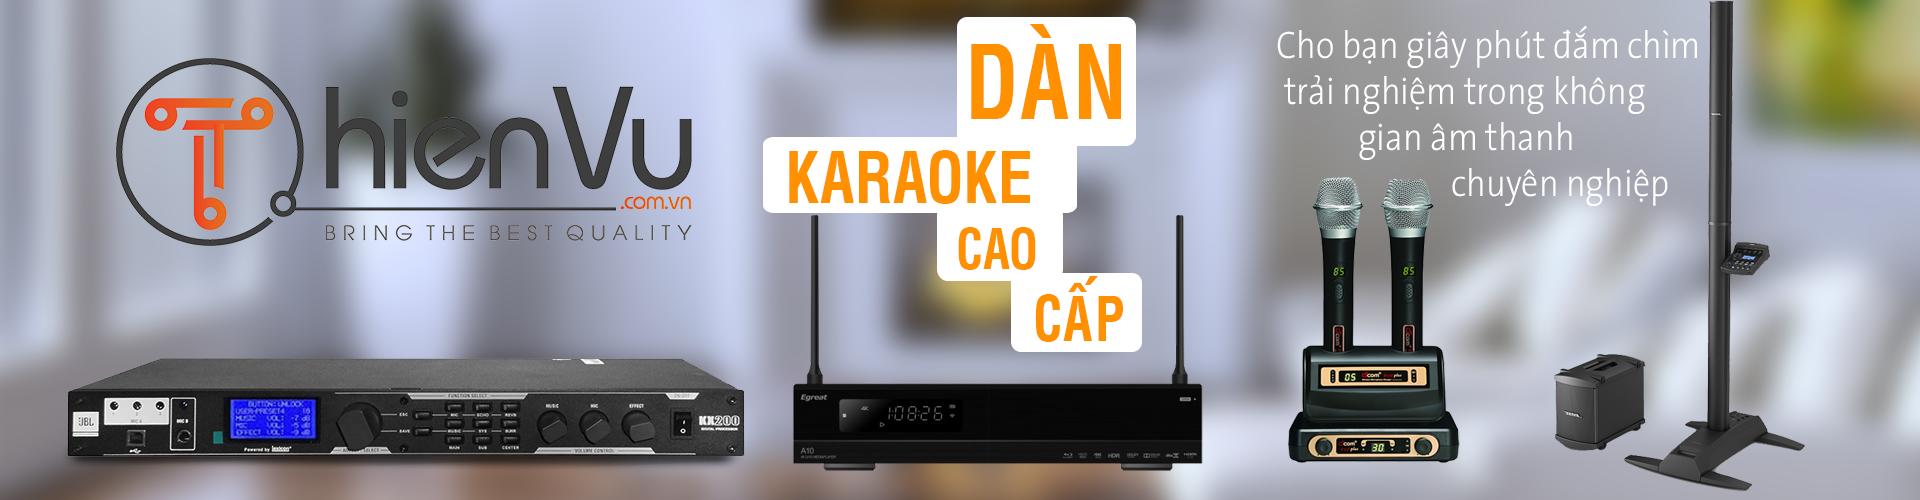 dan-karaoke-gia-dinh